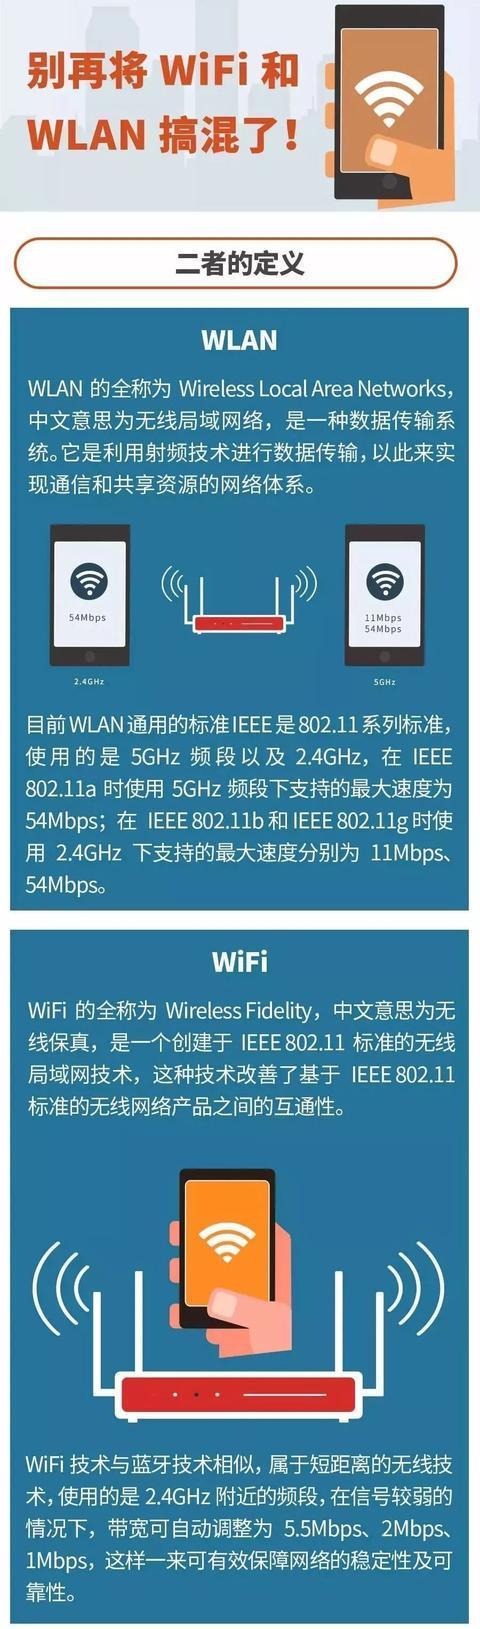 WiFi和WLAN傻傻分不清楚?别再搞混了